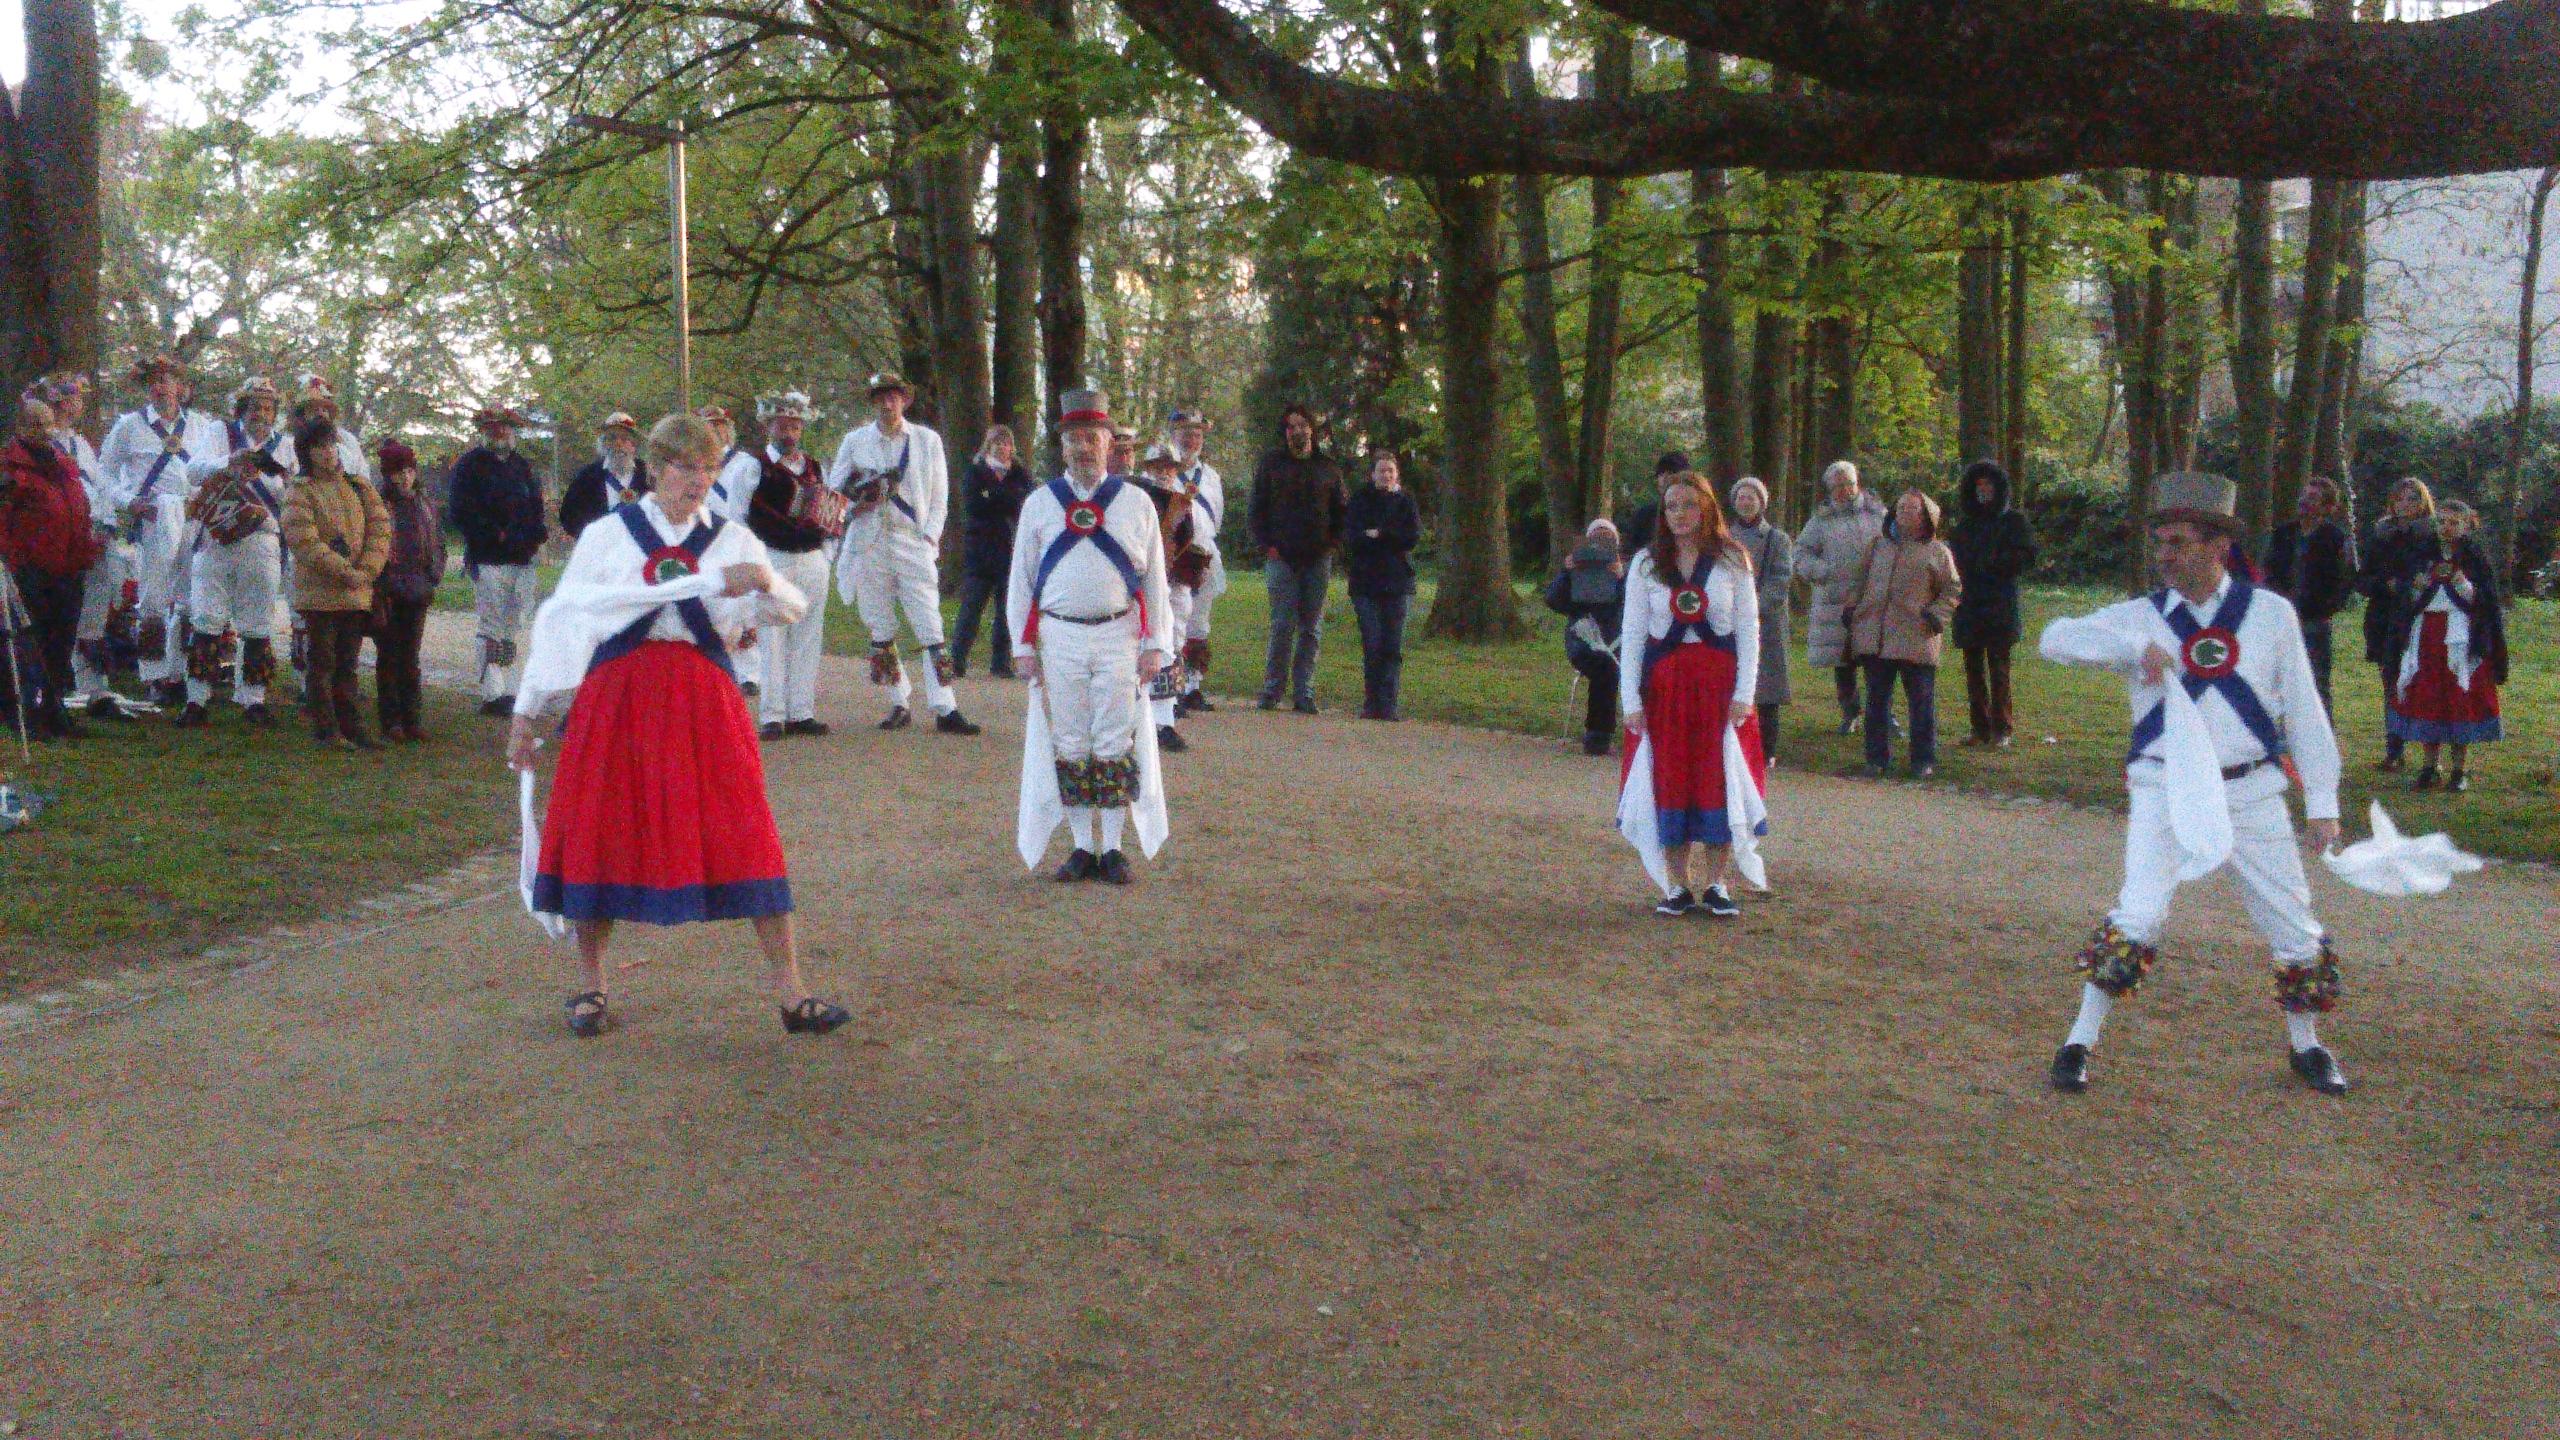 Jockey and Green Horse Morris dancing at Dawn in Anderlect, Brussels - May 2016